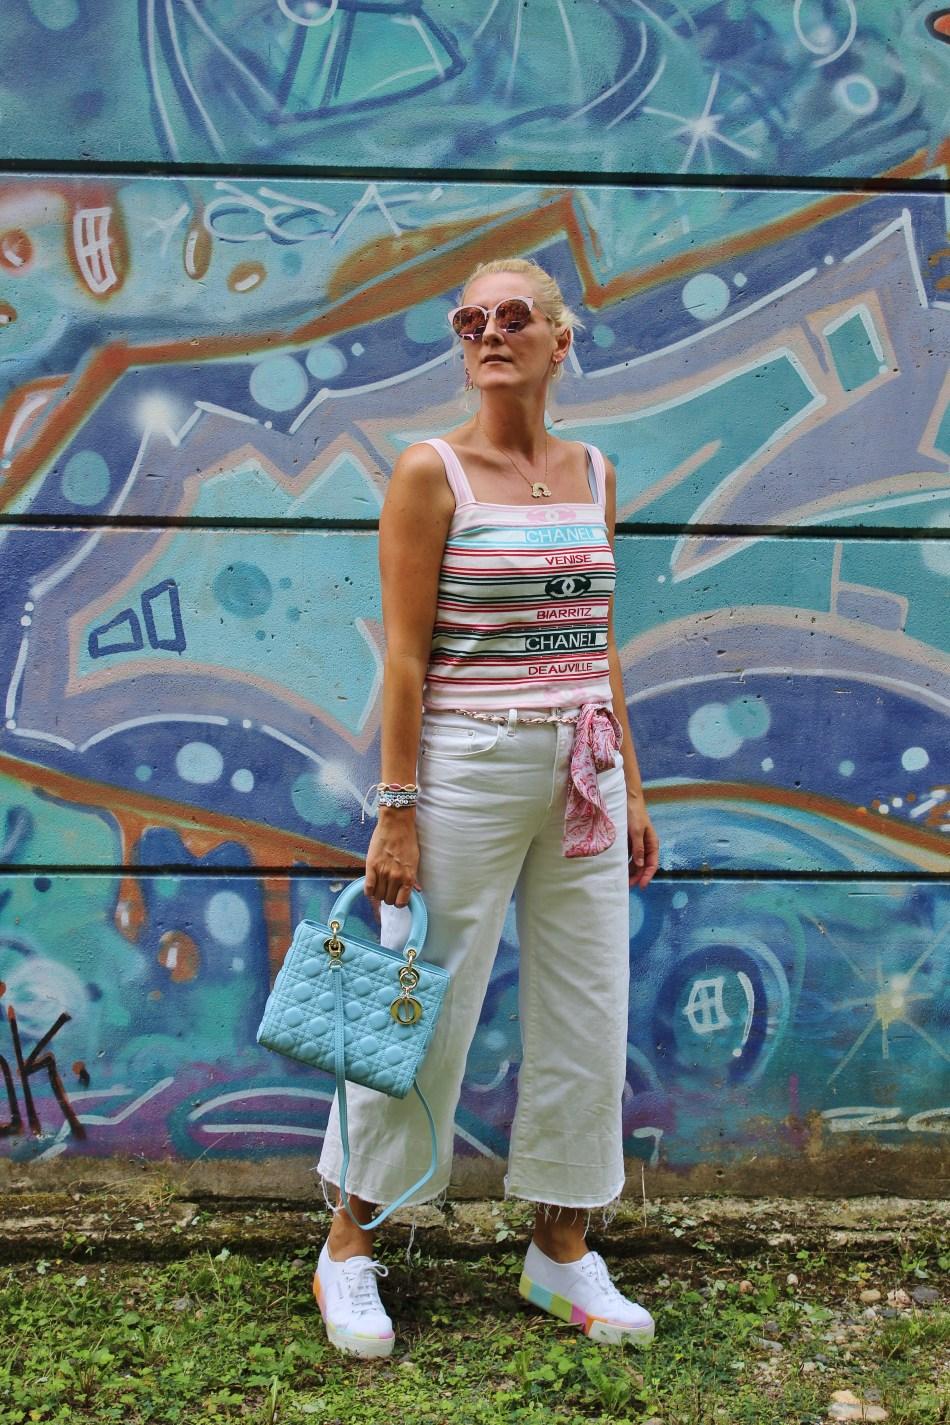 Culottes-Palazzojeans-Superga-Plateau-Sneakers-Rainbow-Dior-MissDior-Bag-carrieslifestyle-Tamara-Prutsch